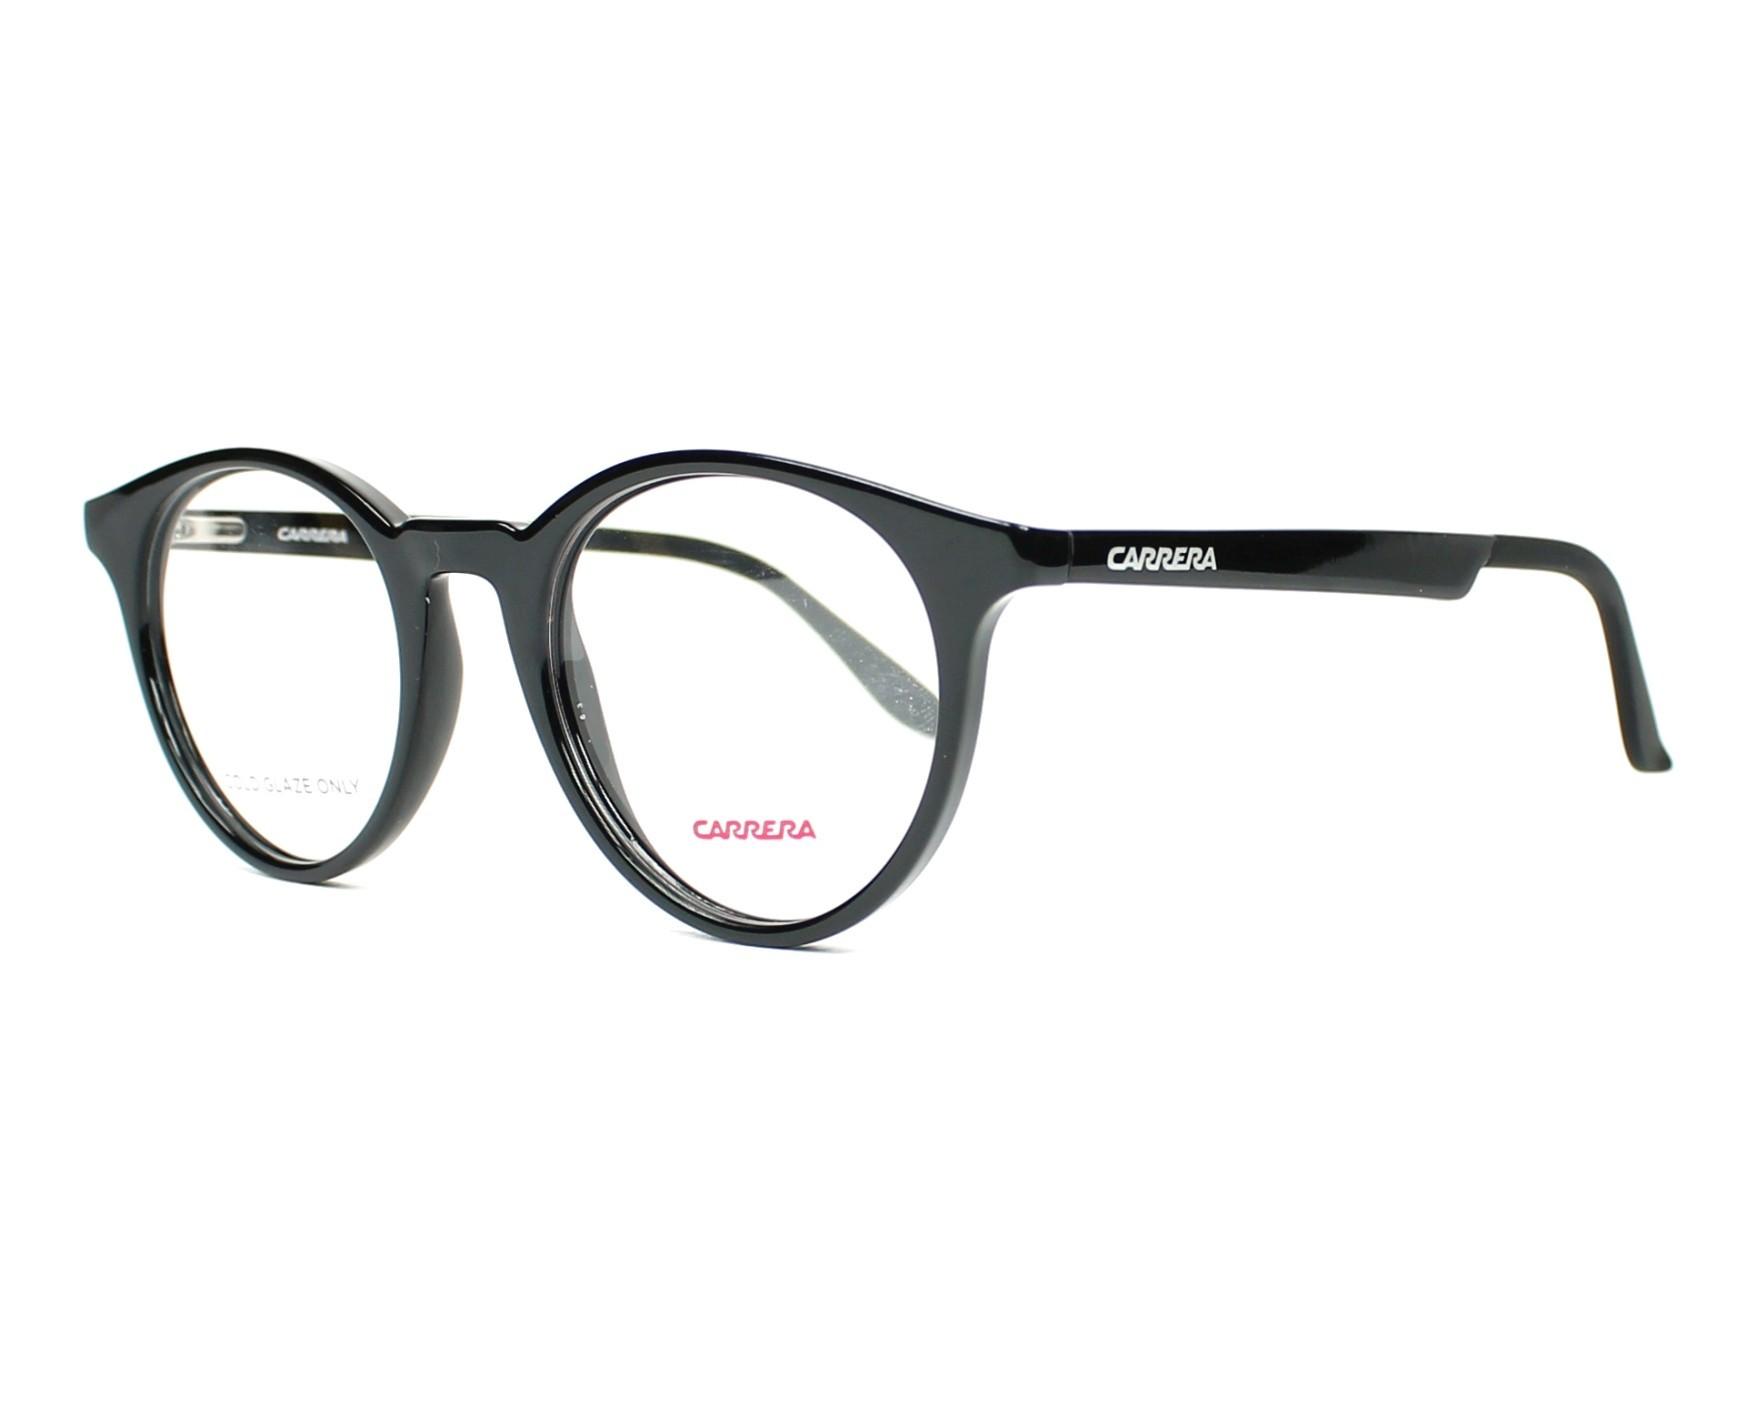 00471adc0a6 eyeglasses Carrera CA-5544 D28 48-20 Black profile view